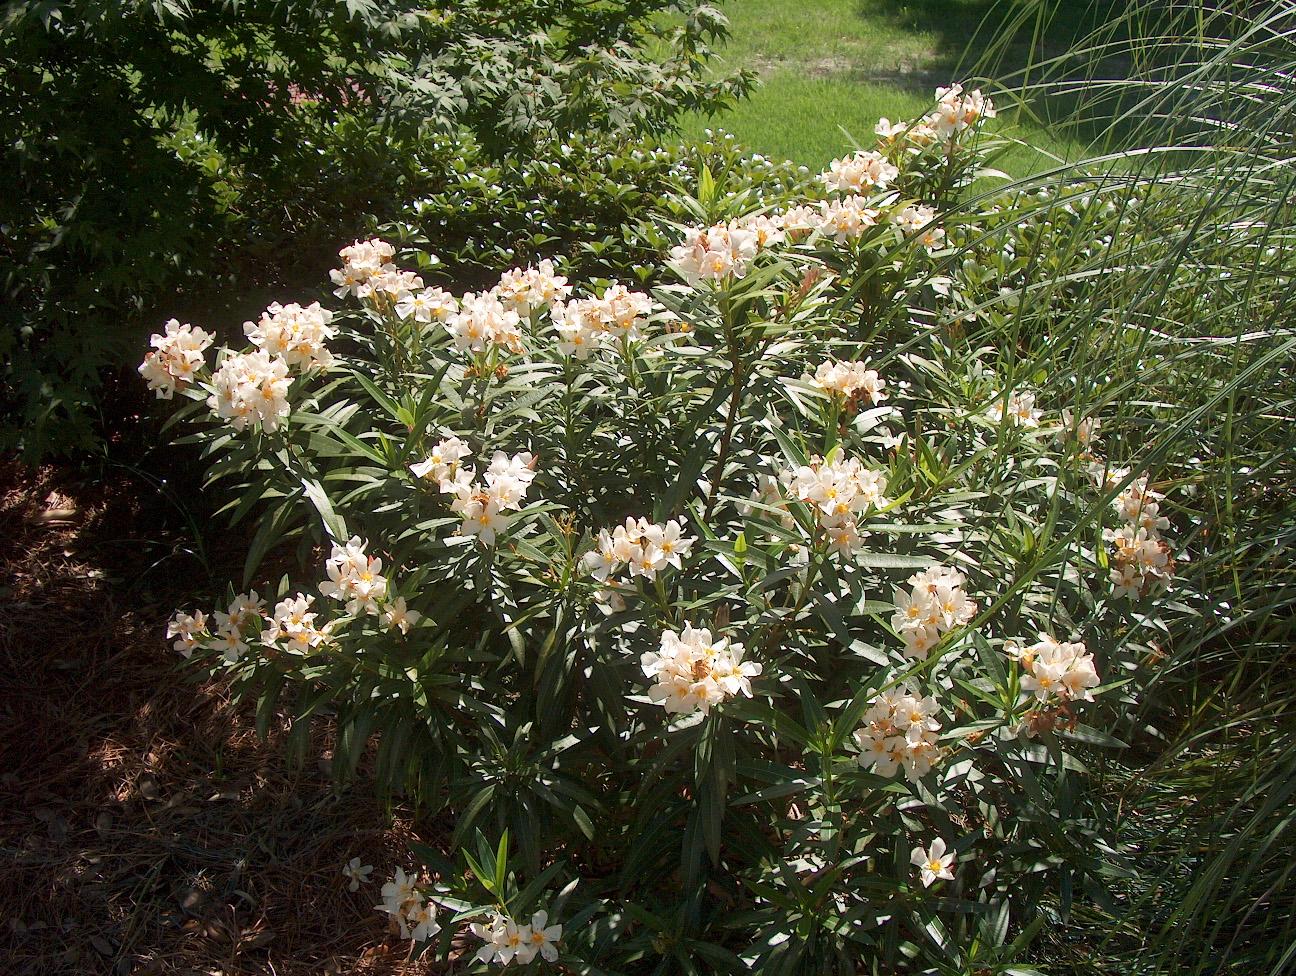 Nerium oleander 'Dwarf' / Nerium oleander 'Dwarf'